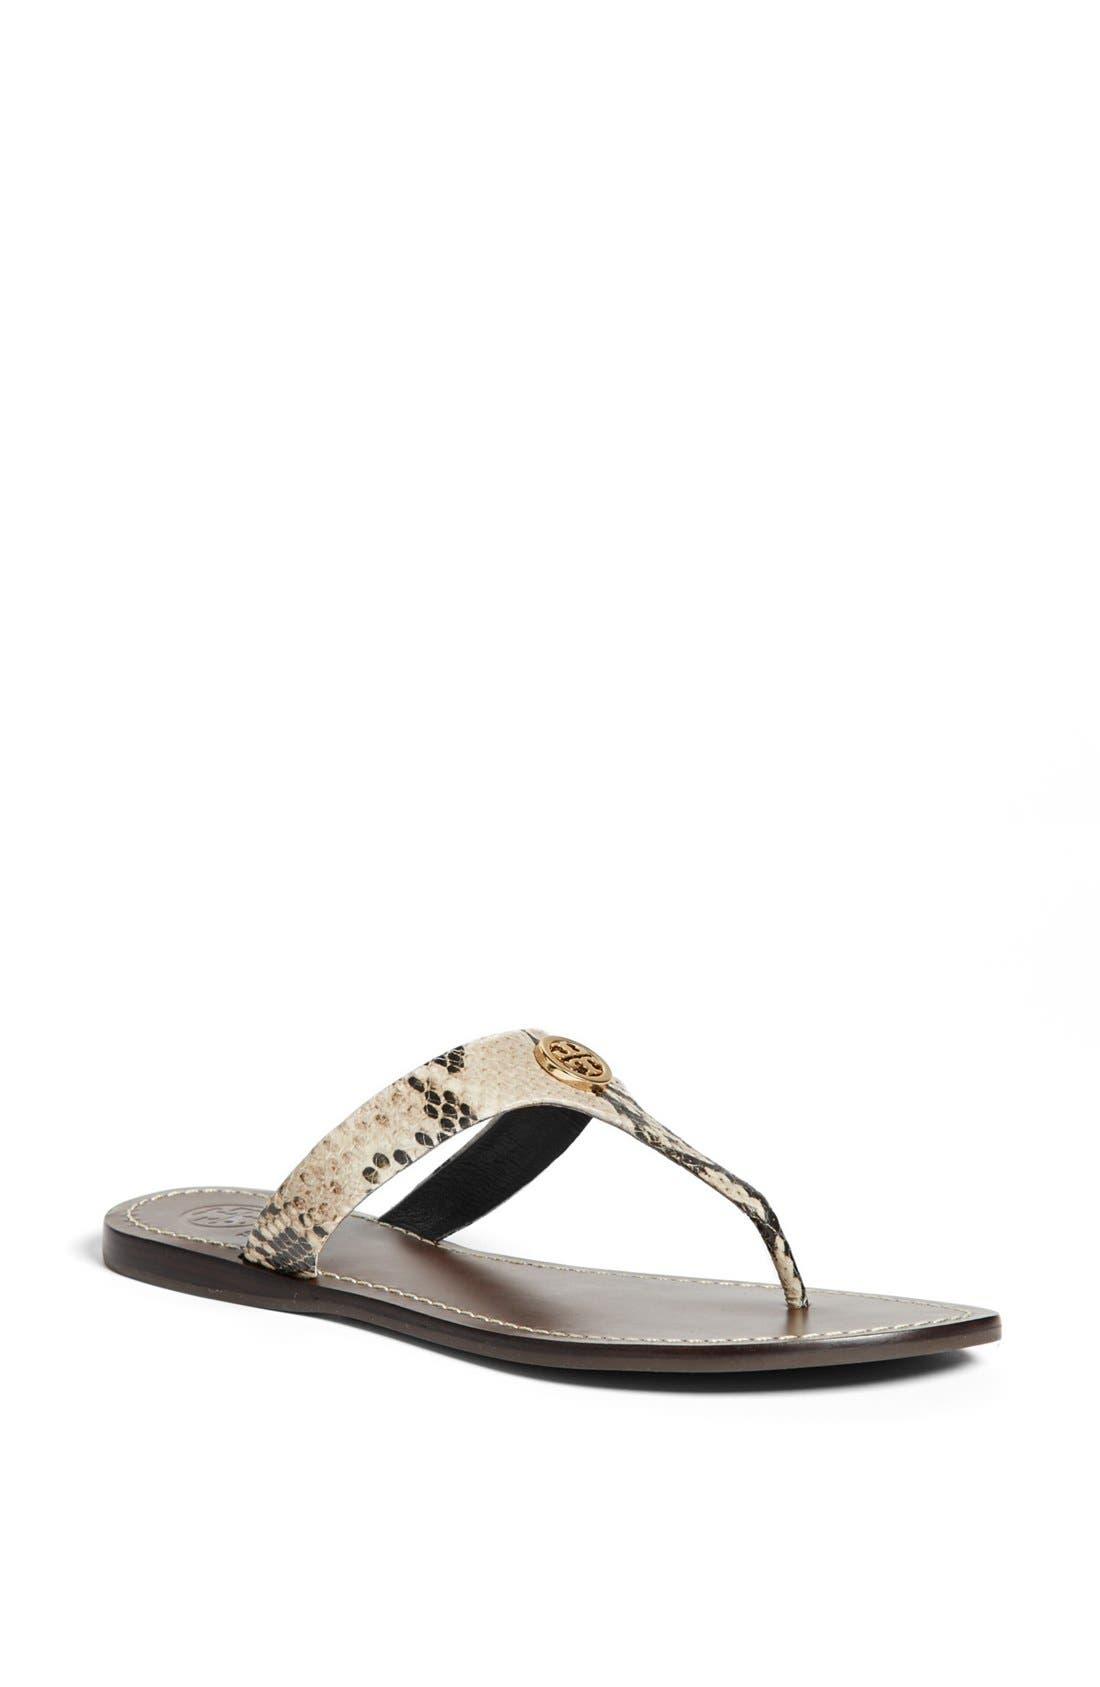 Main Image - Tory Burch 'Cameron' Thong Sandal